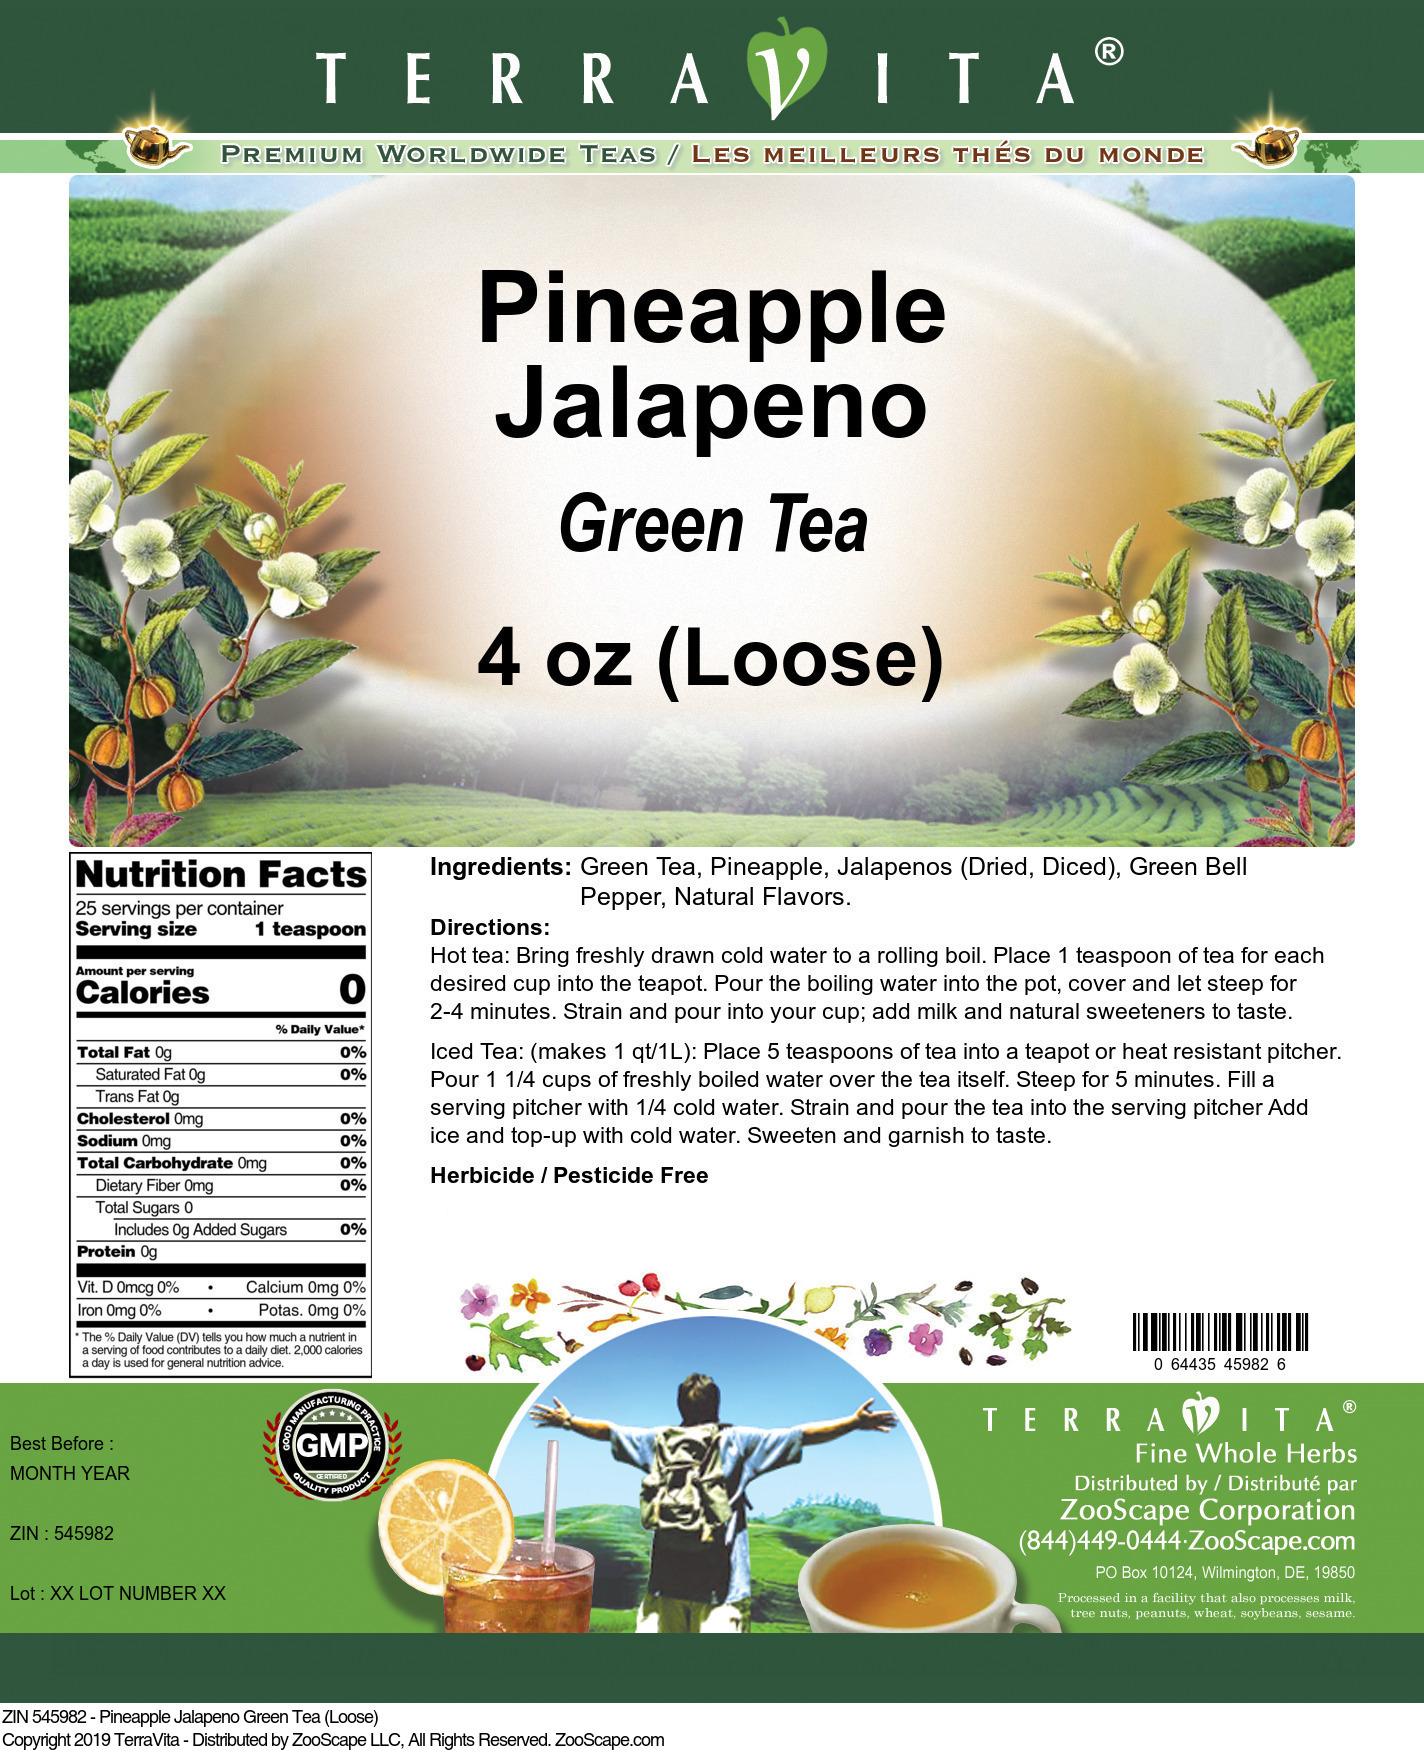 Pineapple Jalapeno Green Tea (Loose)